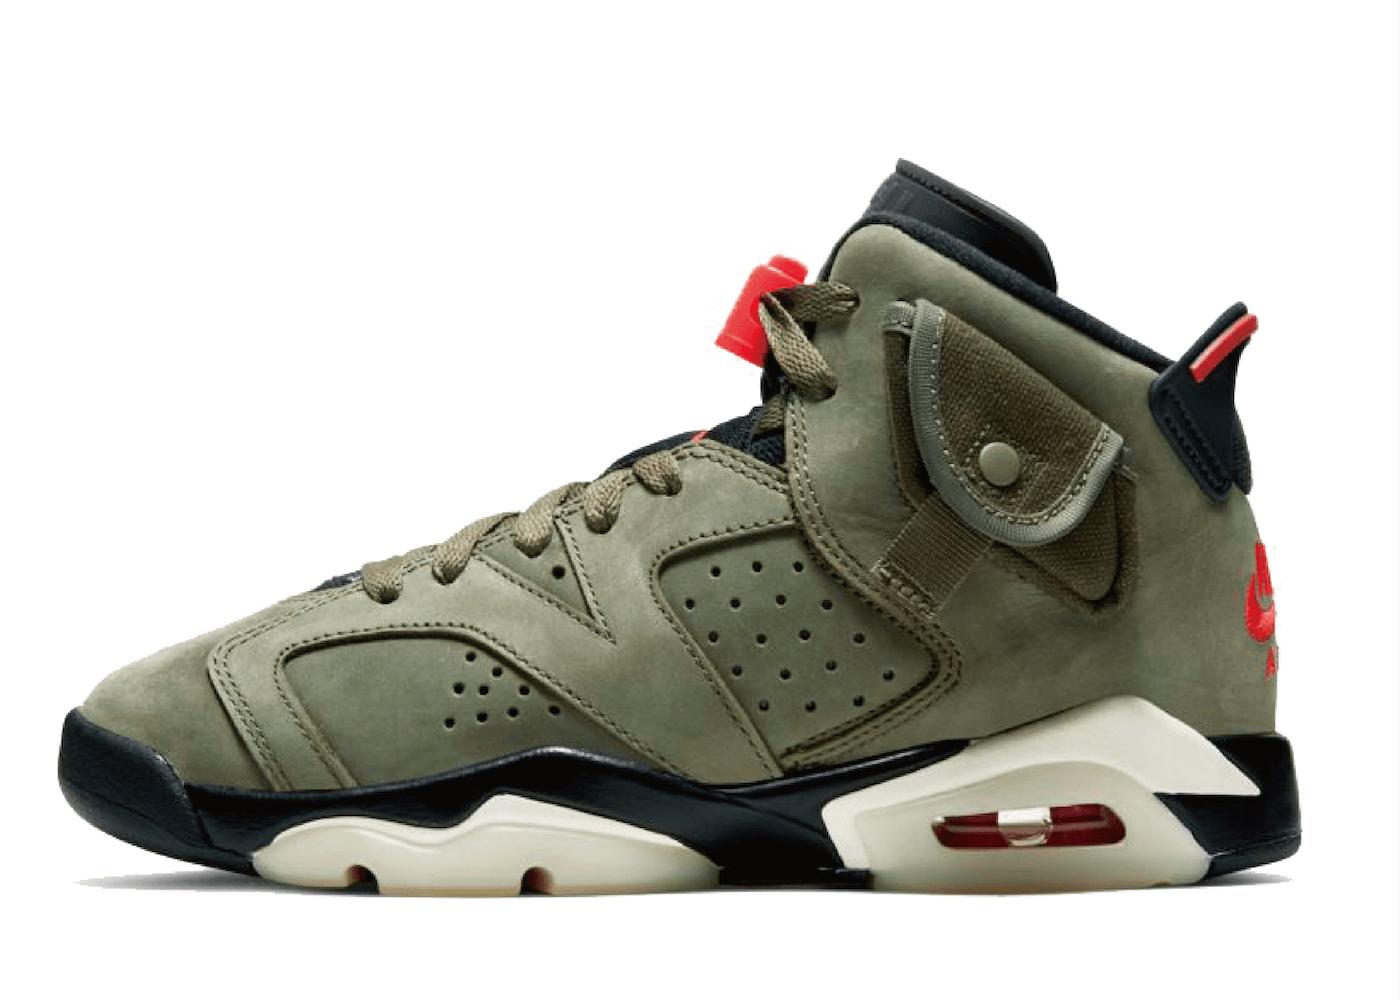 Nike Air Jordan 6 Retro Travis Scott (GS)の写真